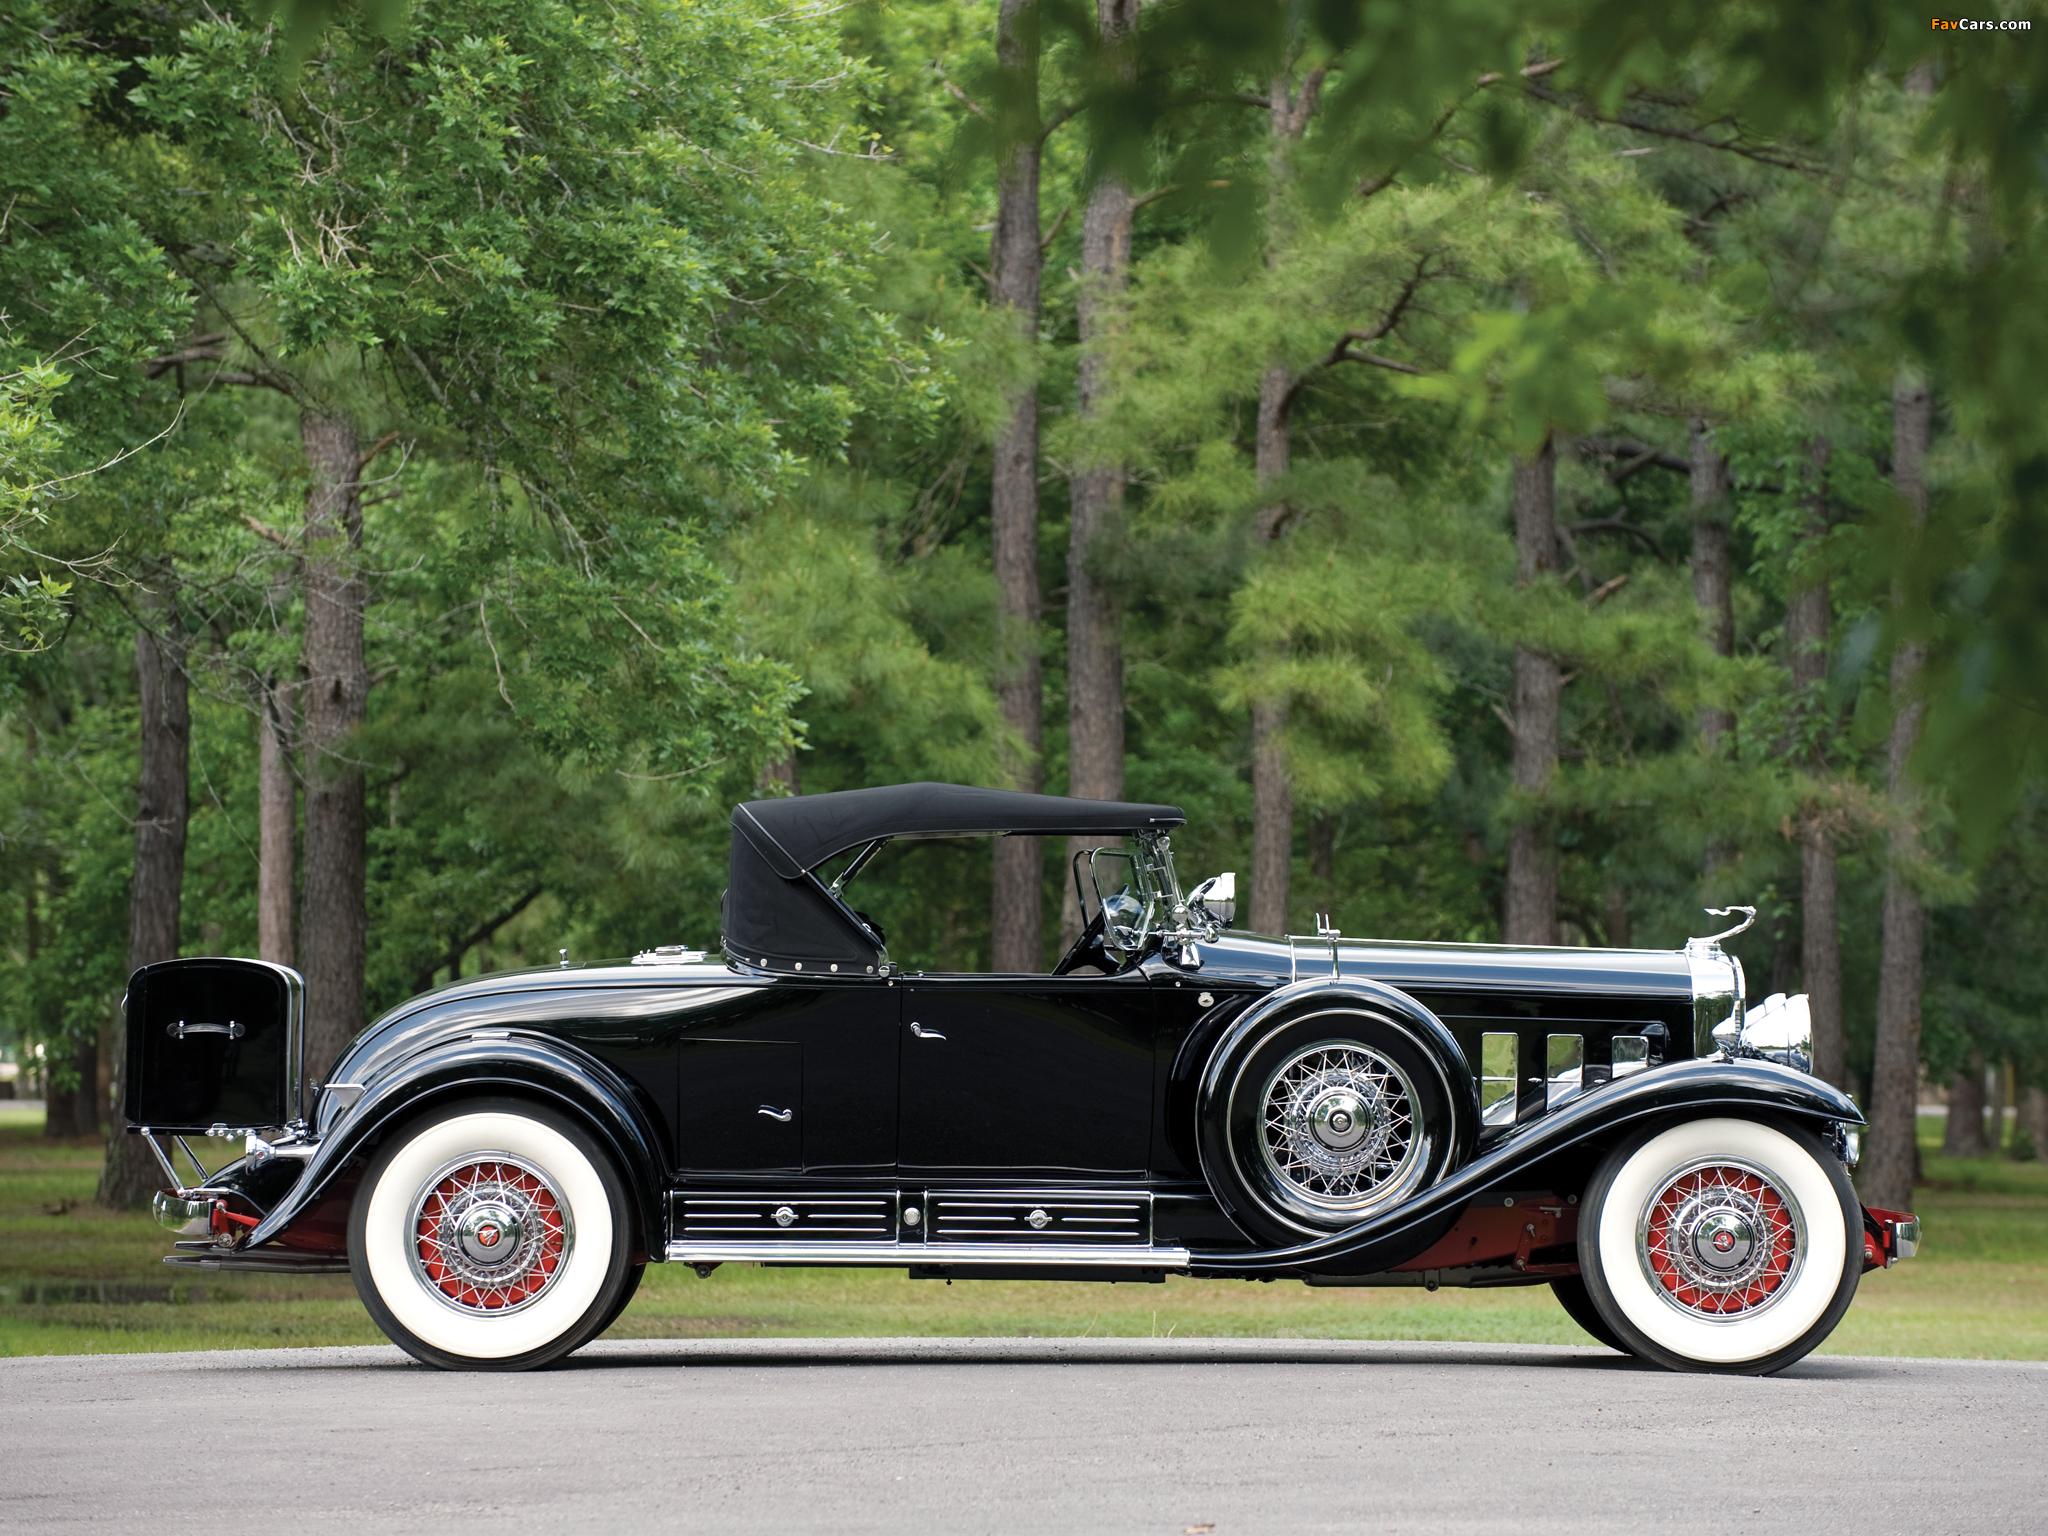 Cadillac V16 452 Roadster 1930 photos (2048 x 1536)